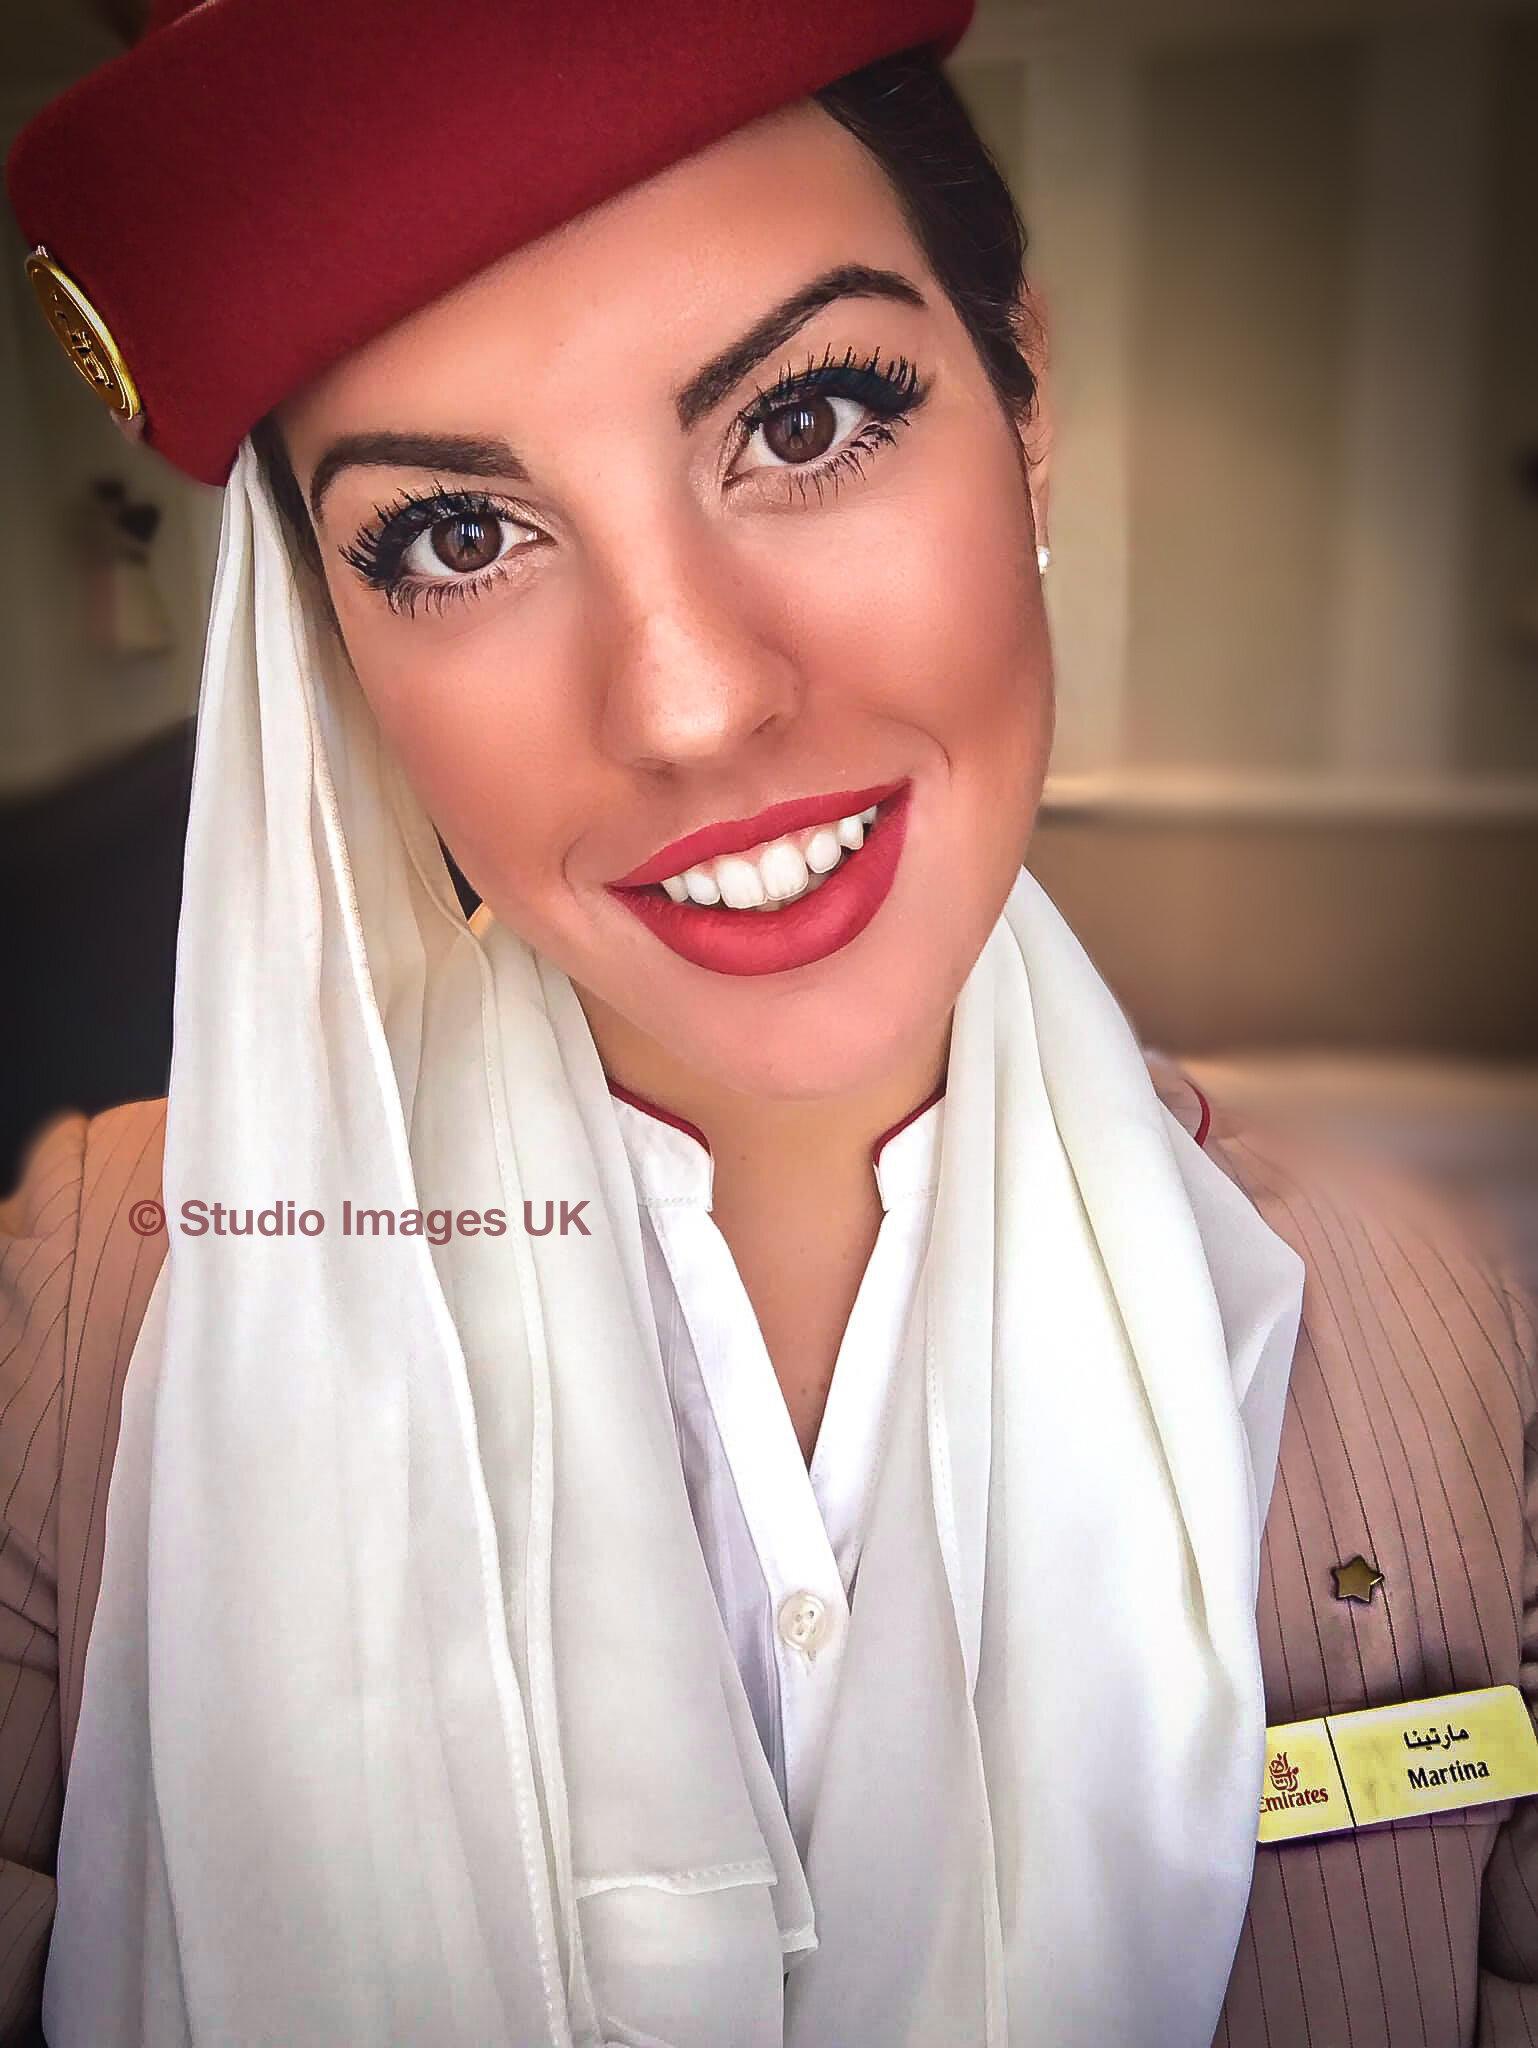 Martina_Pisani_emirates_cabin_crew.jpg